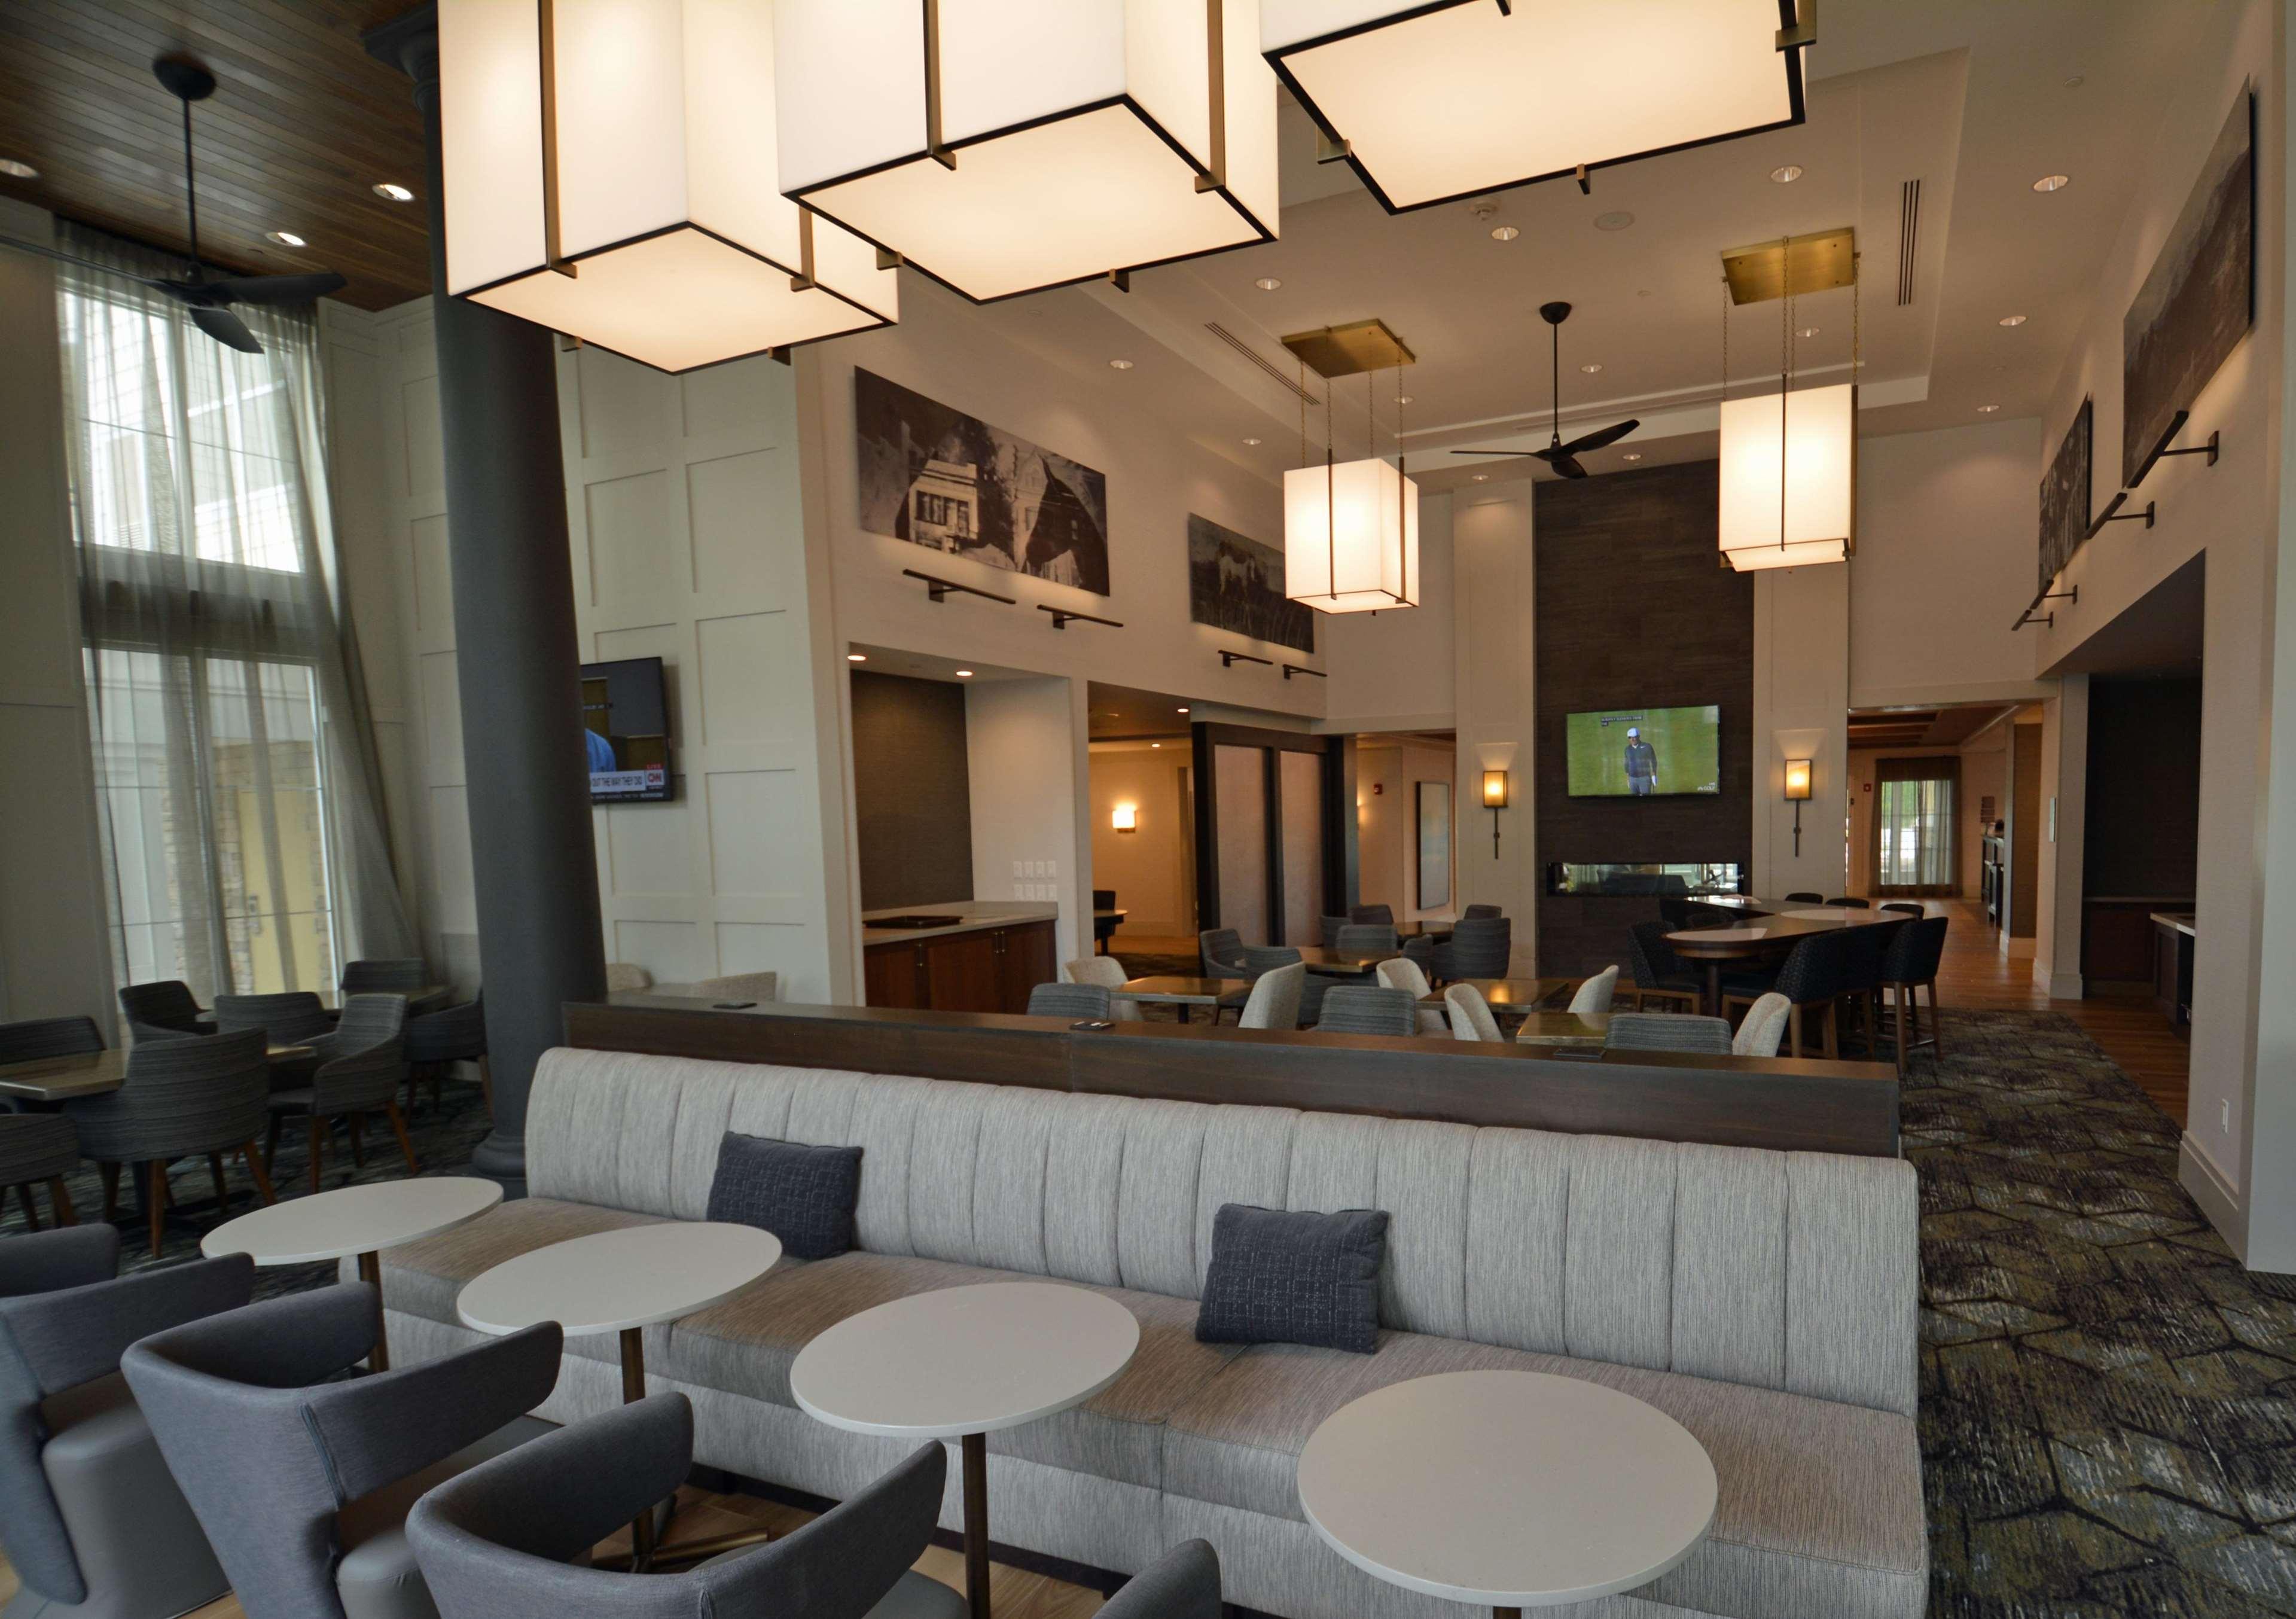 Homewood Suites by Hilton Saratoga Springs image 4